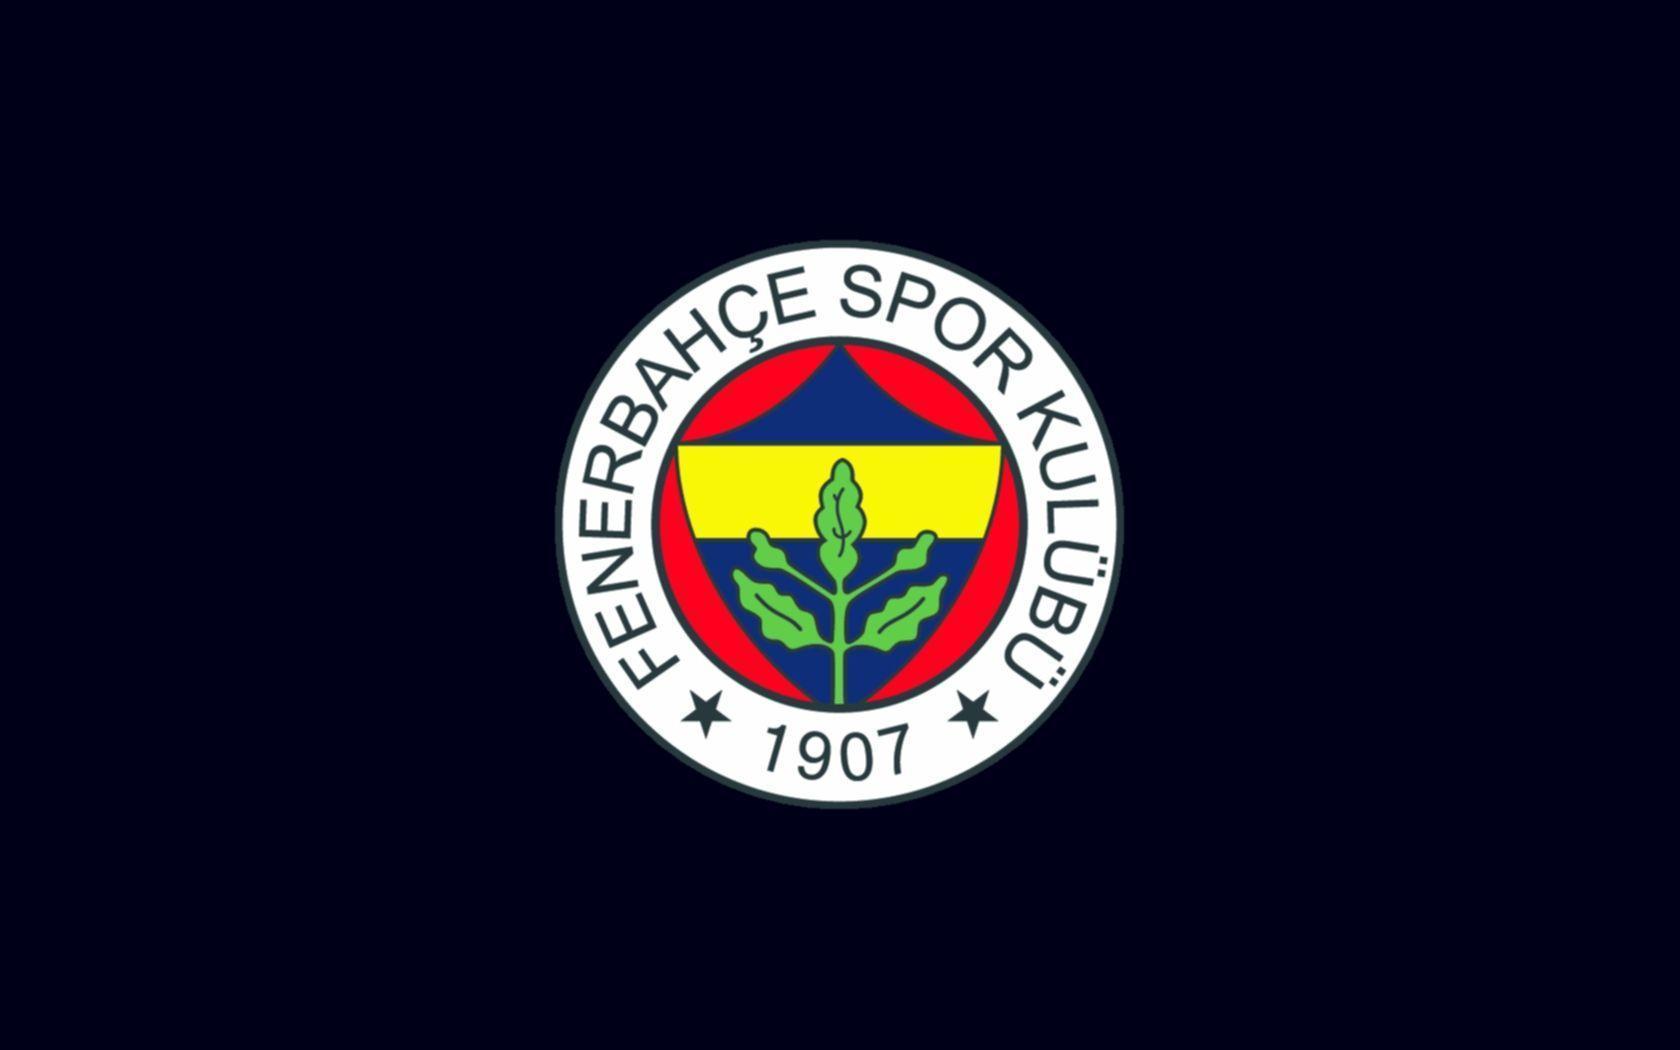 Fenerbahçe S.K. Wallpapers - Wallpaper Cave